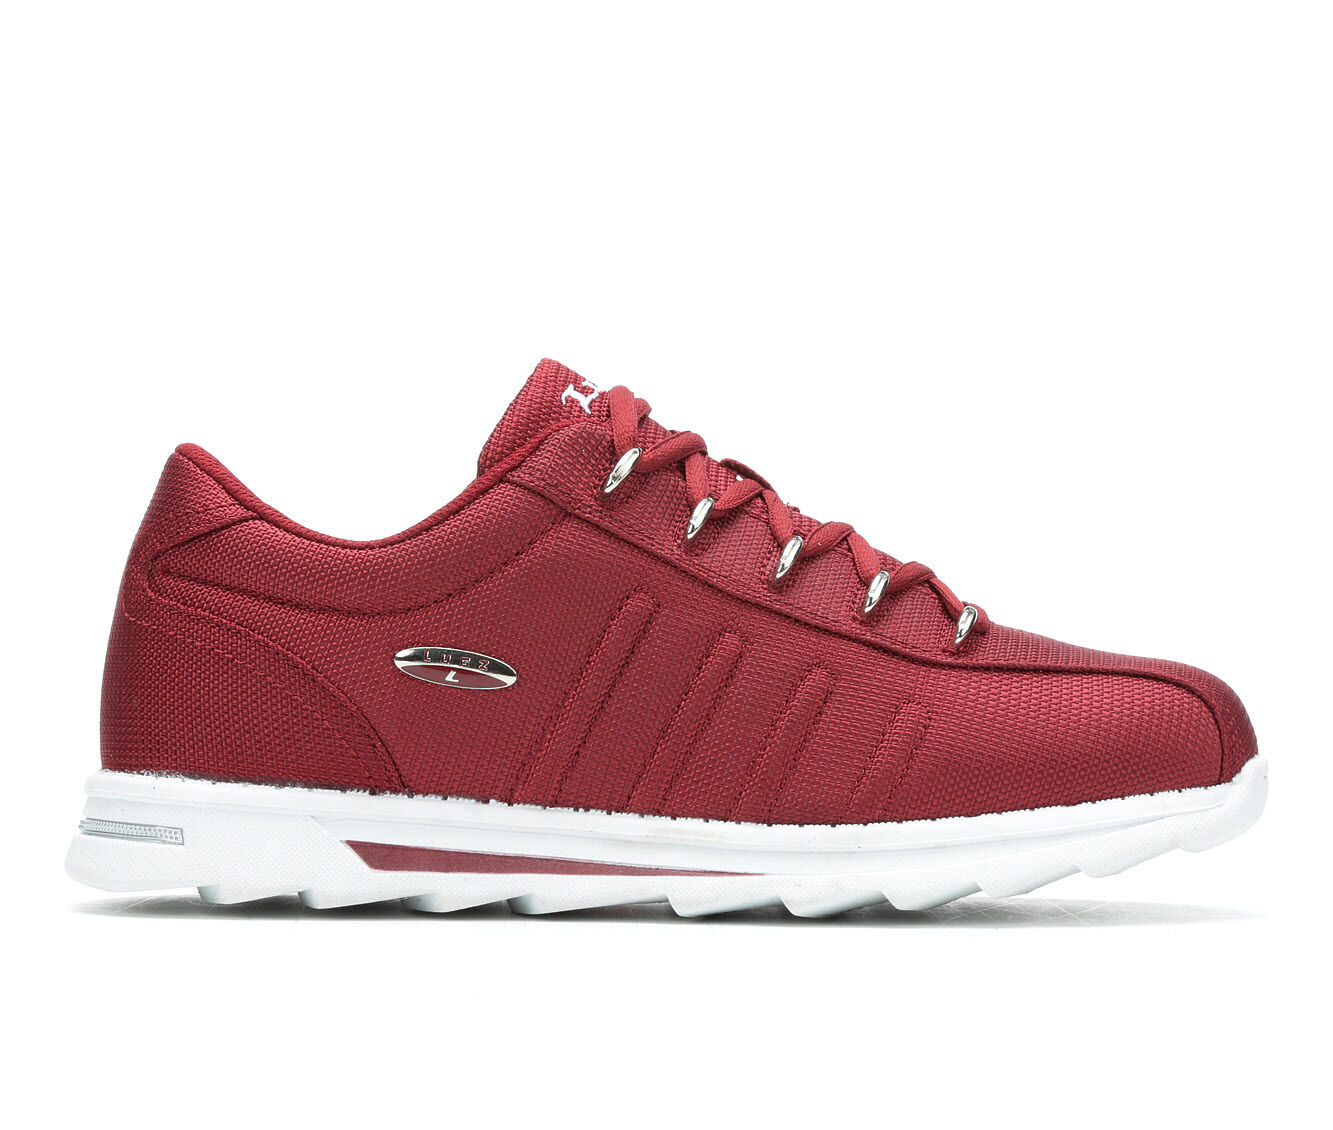 uk shoes_kd1327